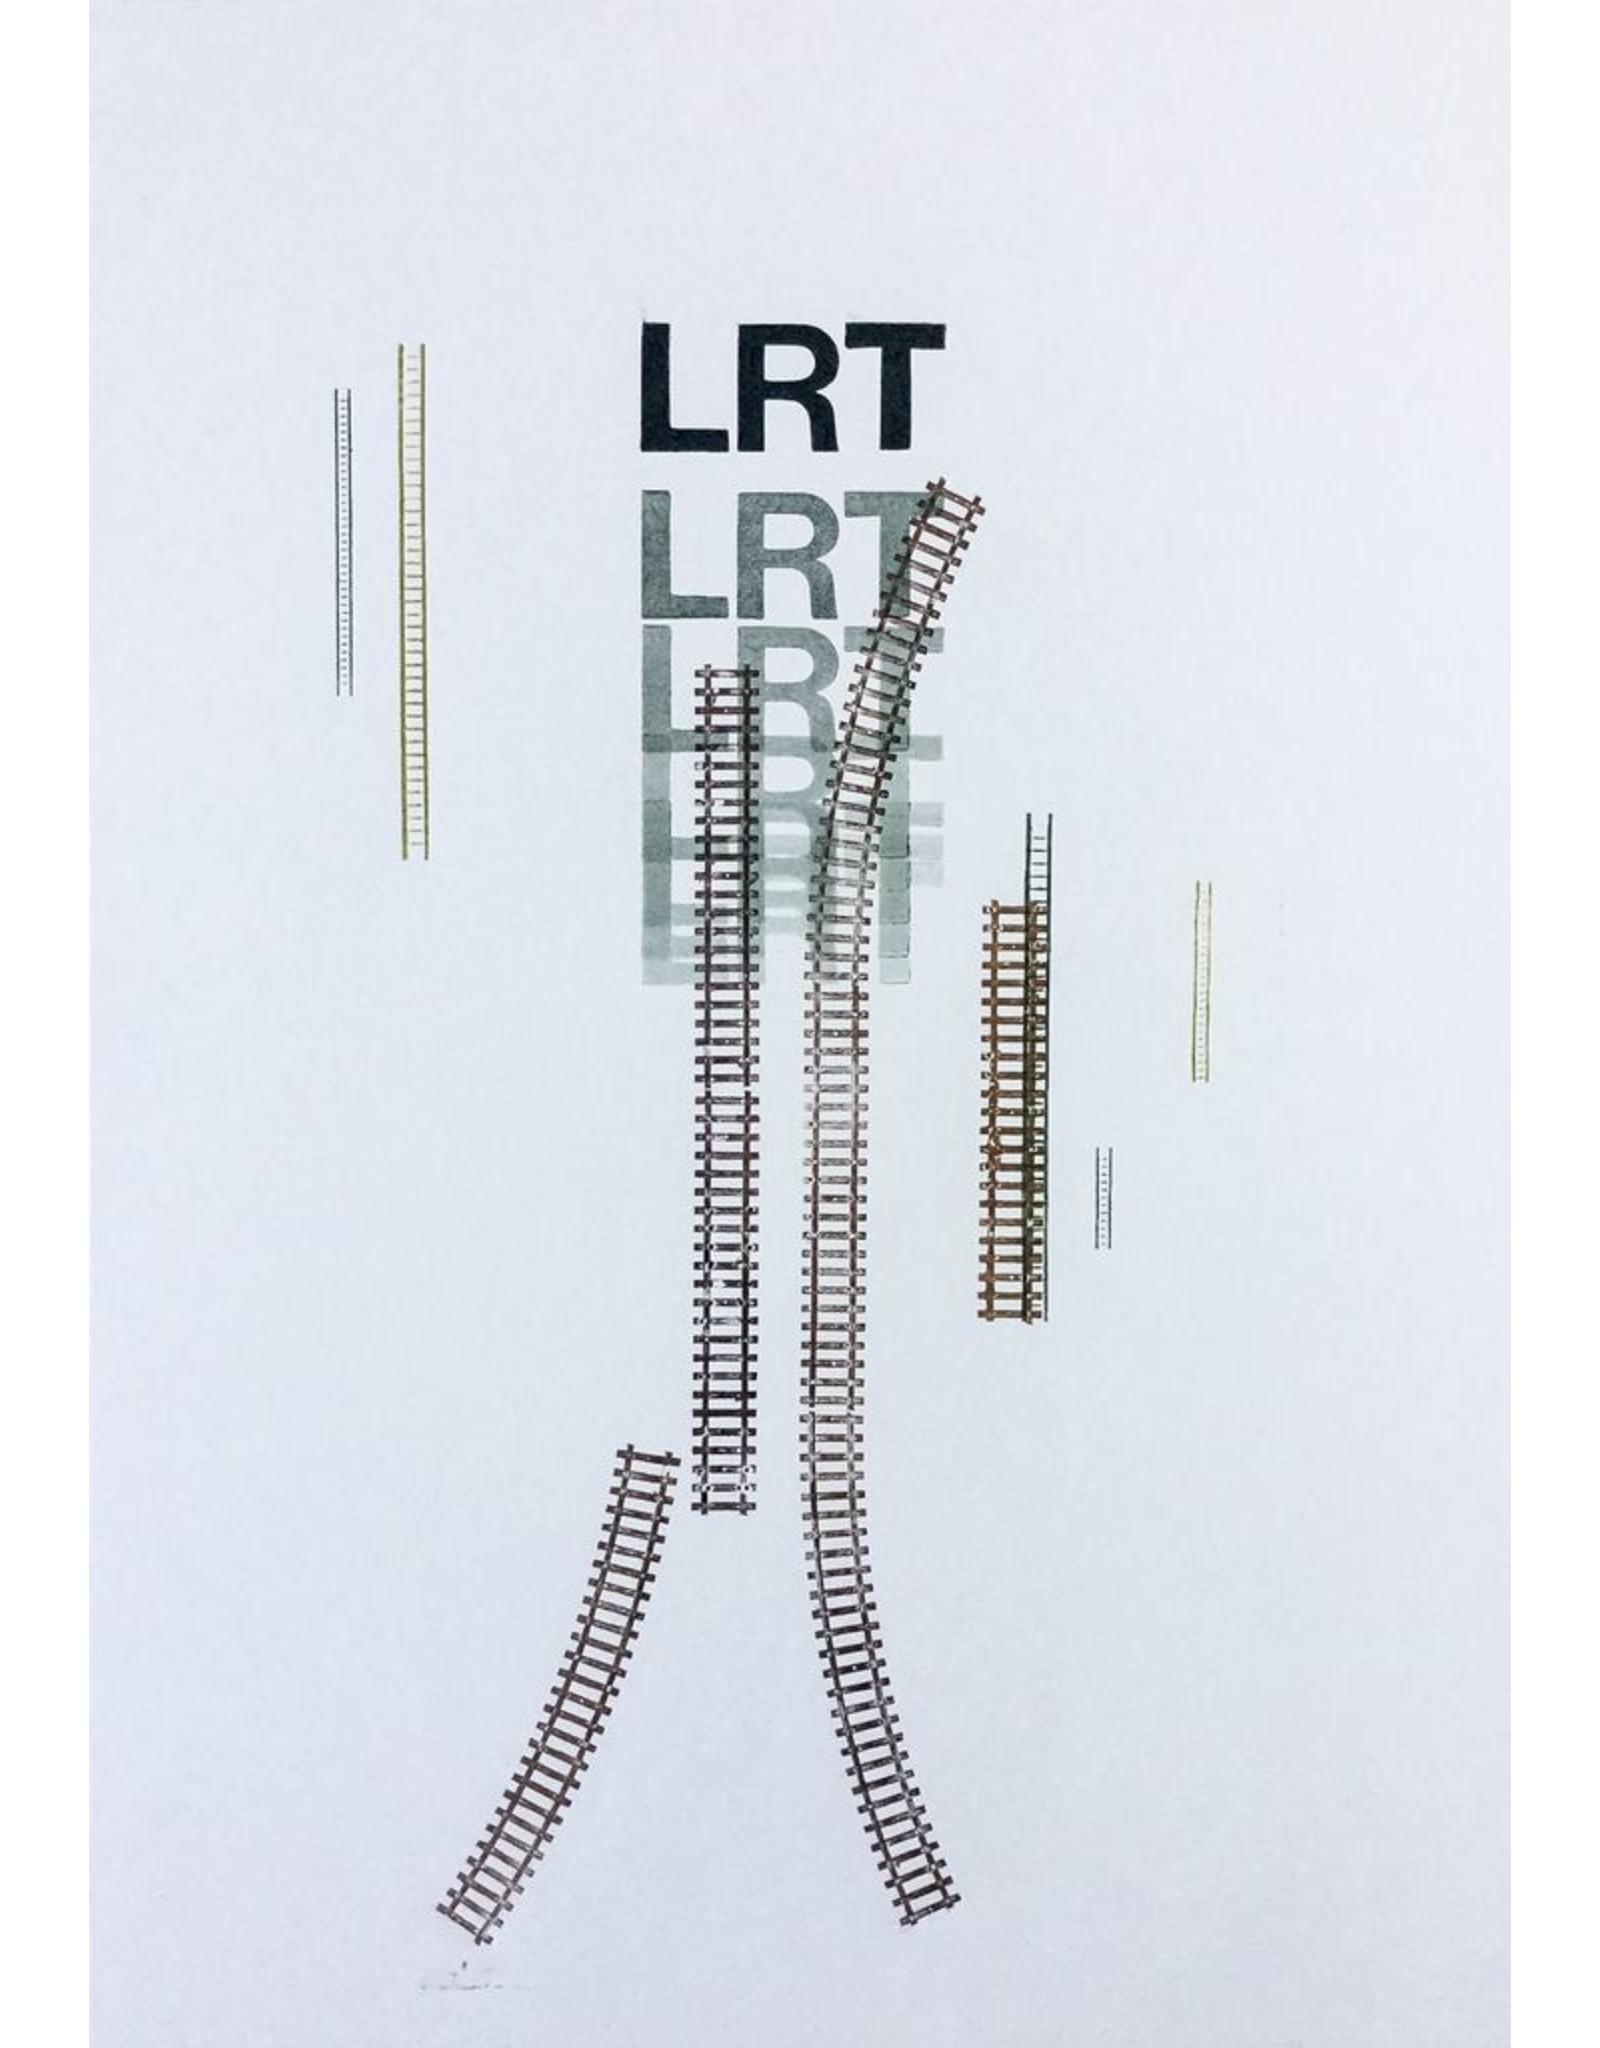 Stebeleski, Darren LRT, Darren Stebeleski